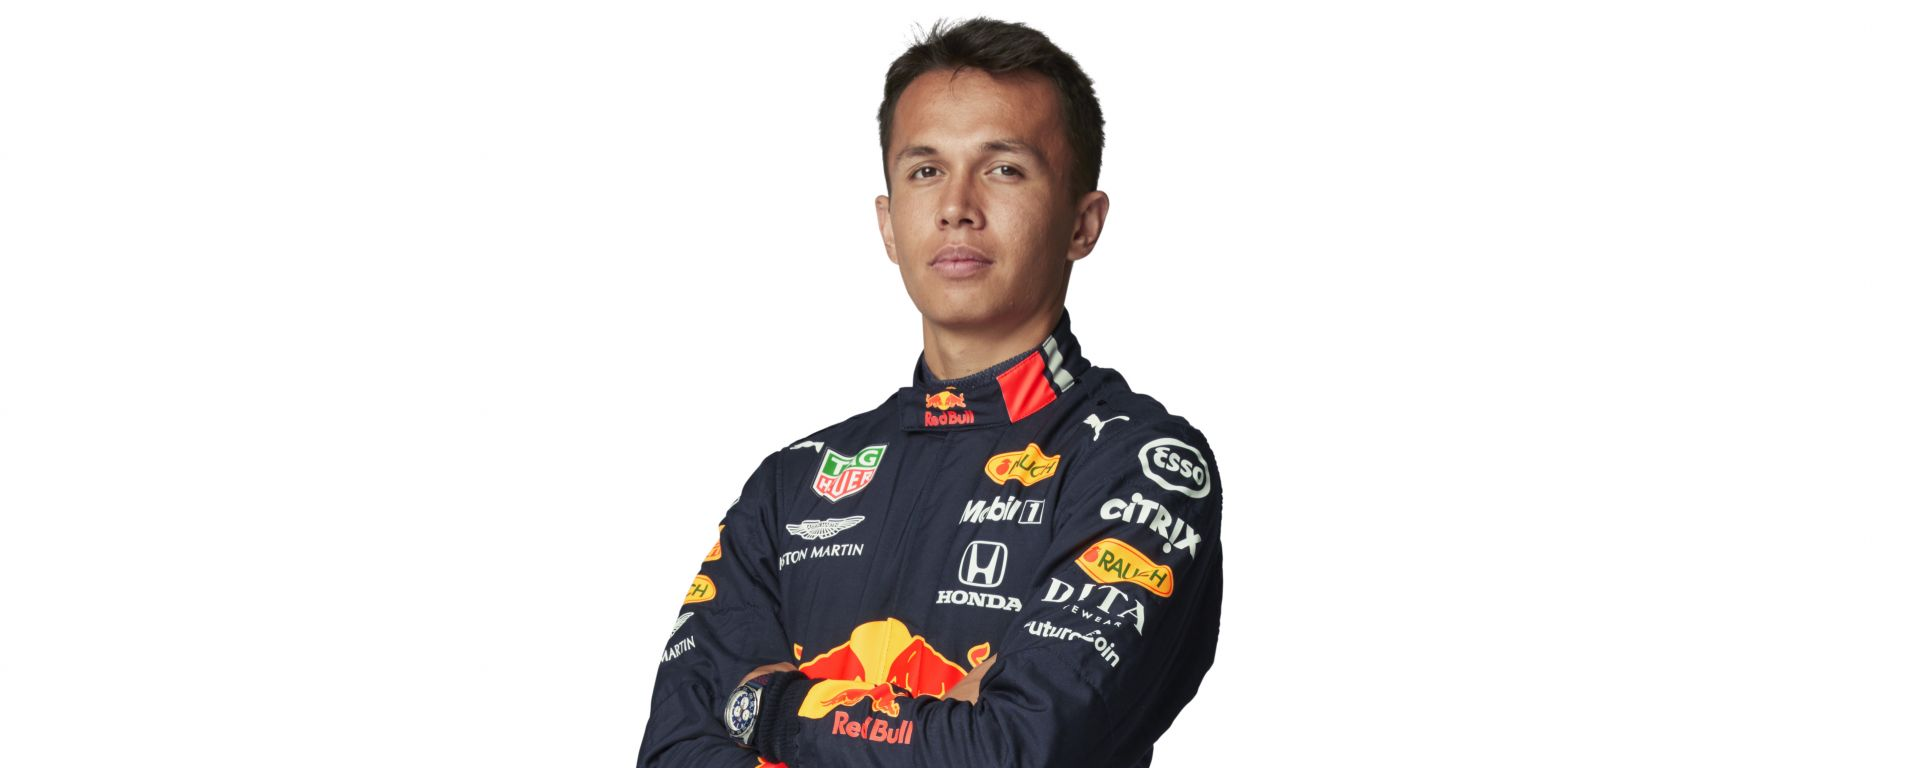 F1 2019, Alexander Albon (Red Bull)